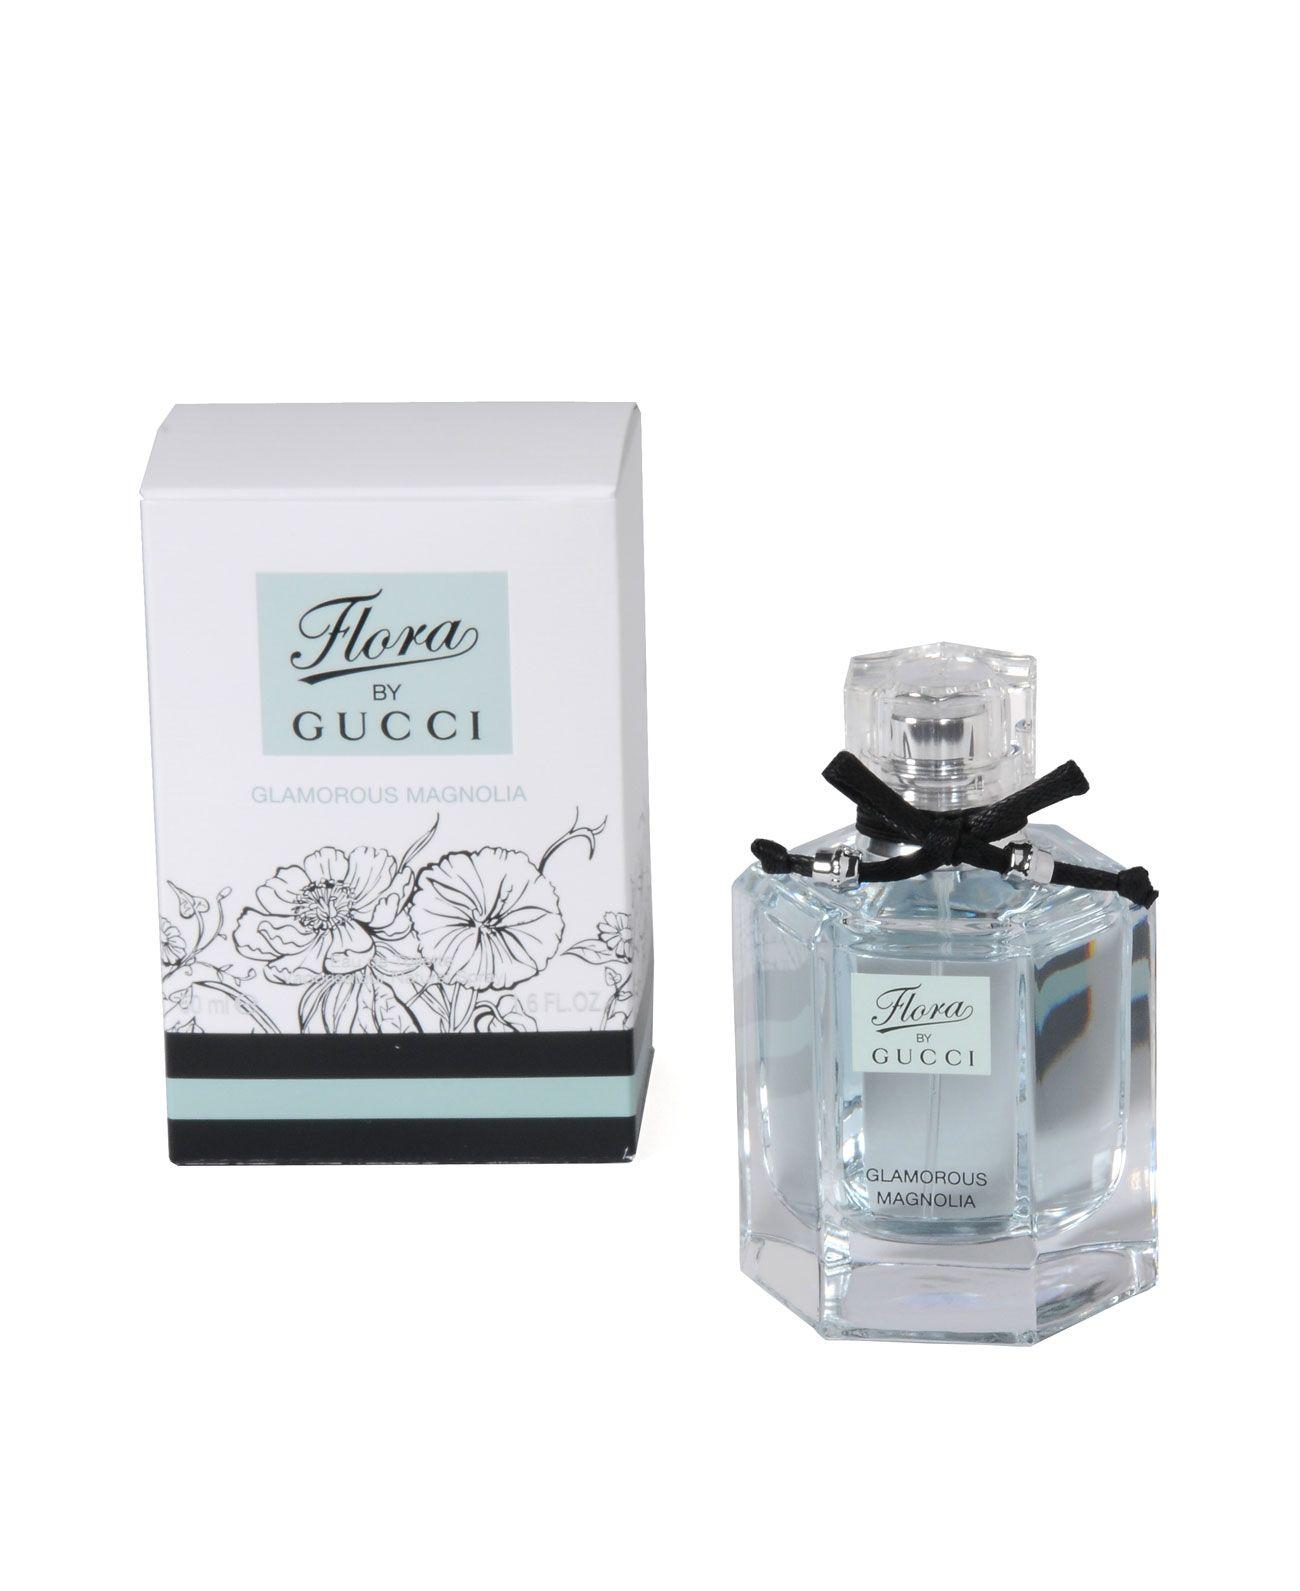 Flora by gucci glamorous magnolia perfume perfume